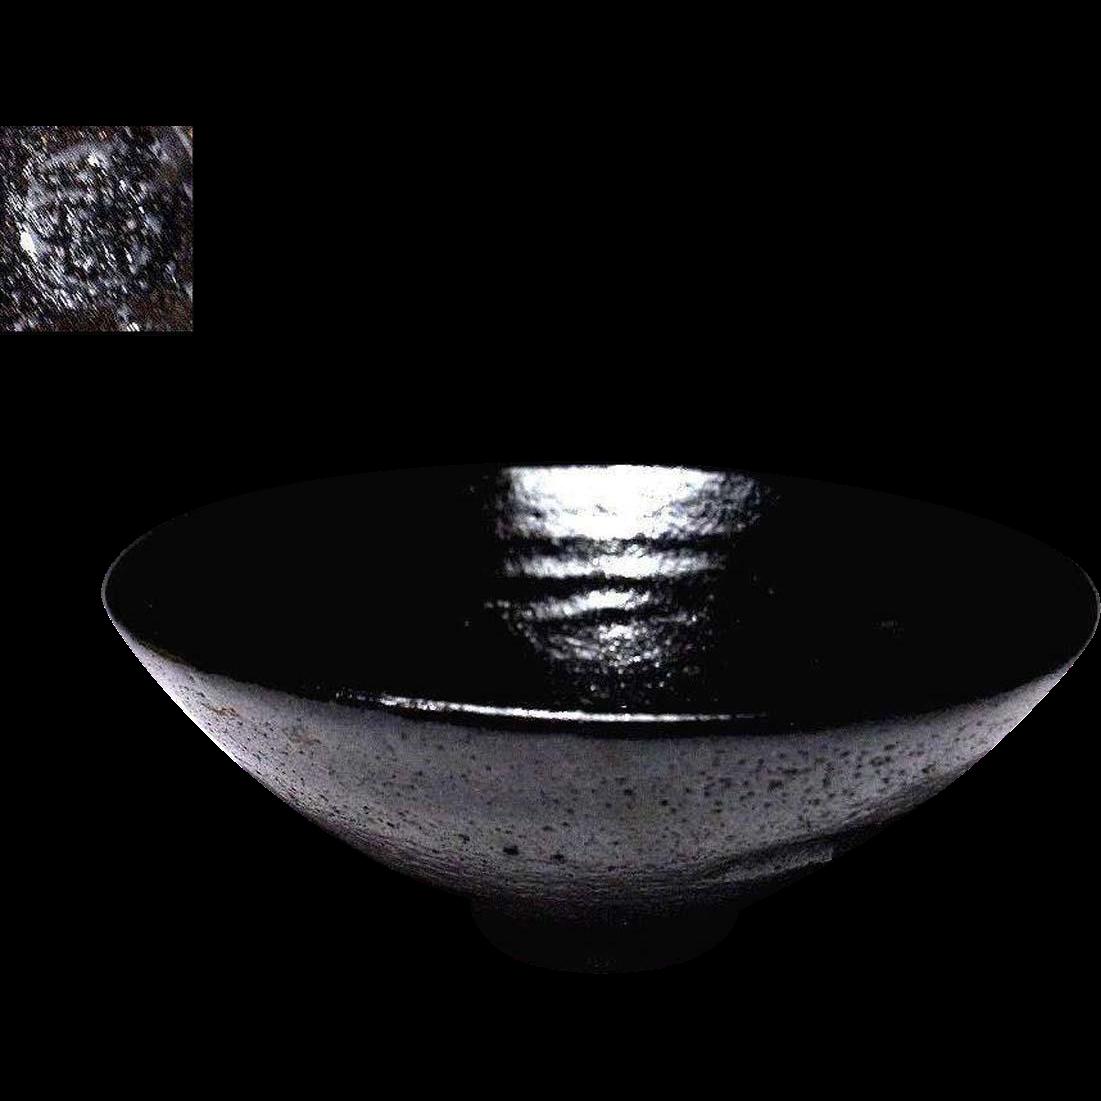 Japanese Vintage Raku- yaki 楽焼 Chawan or Tea Bowl